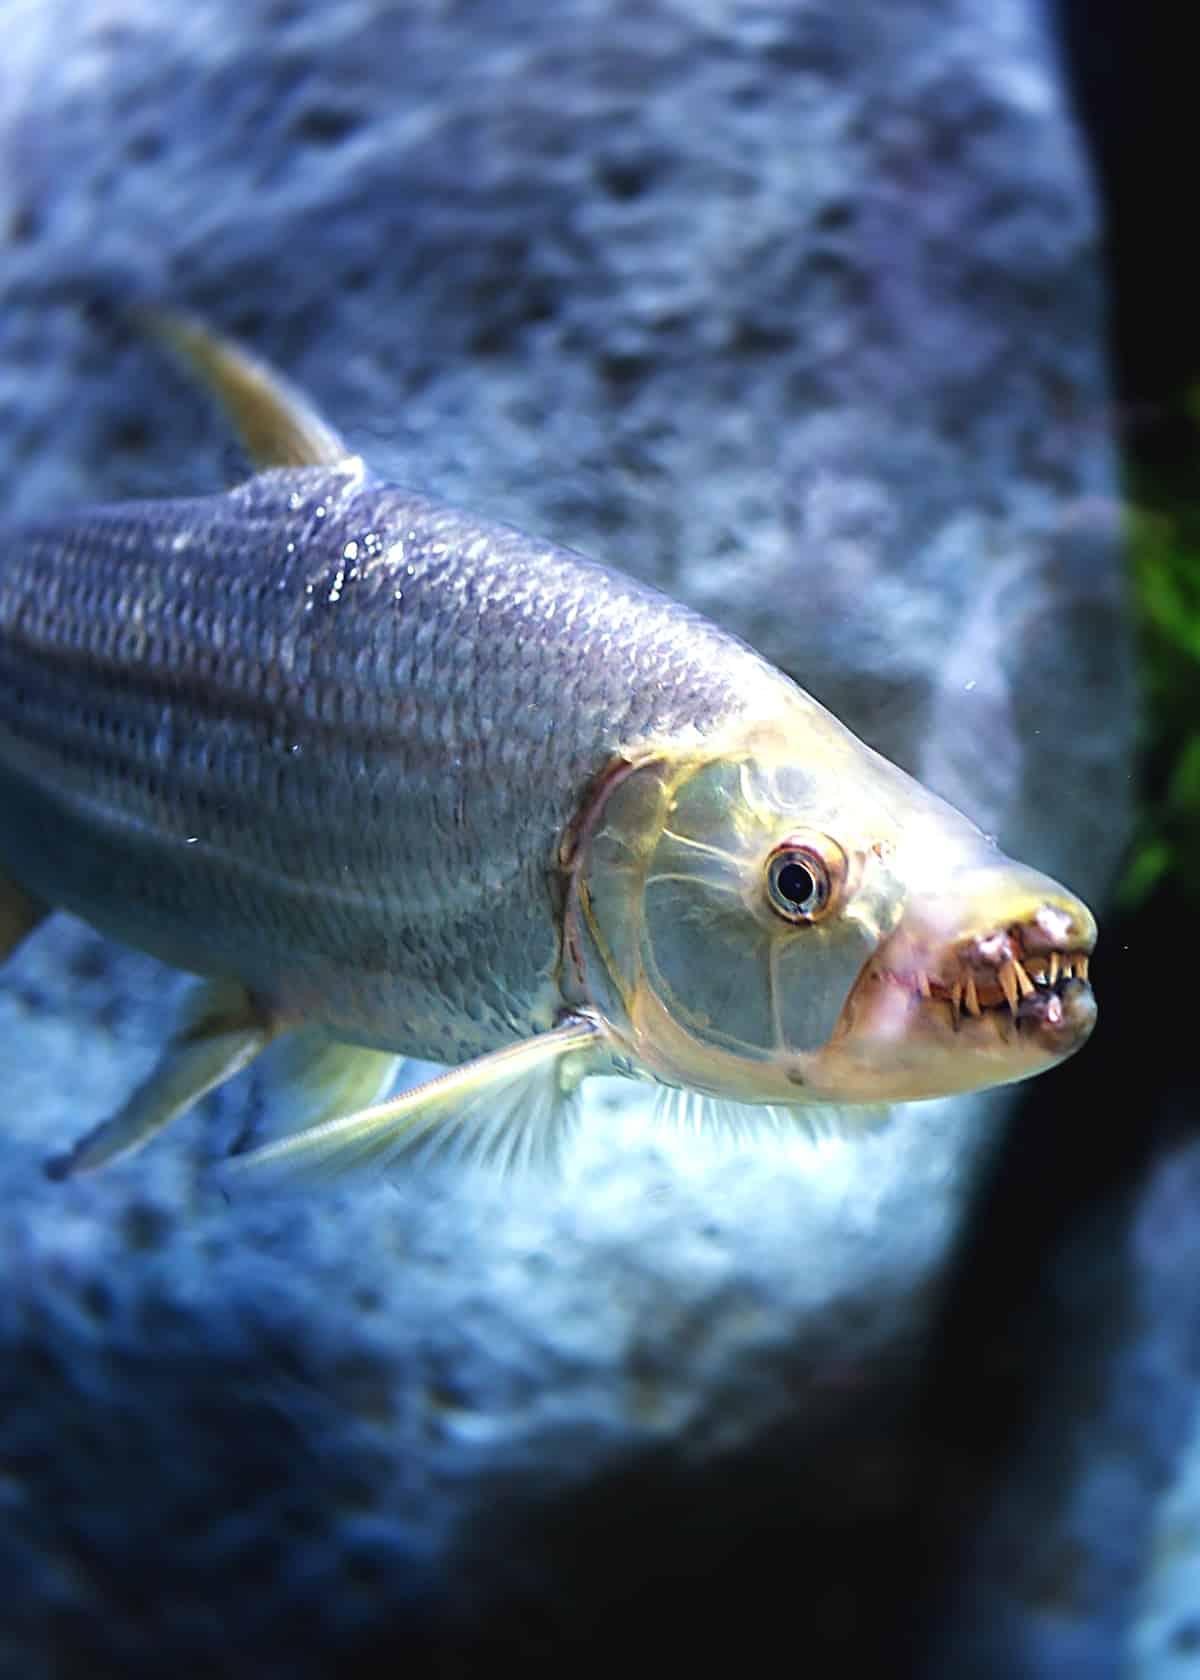 Scary animals goliath tiger fish